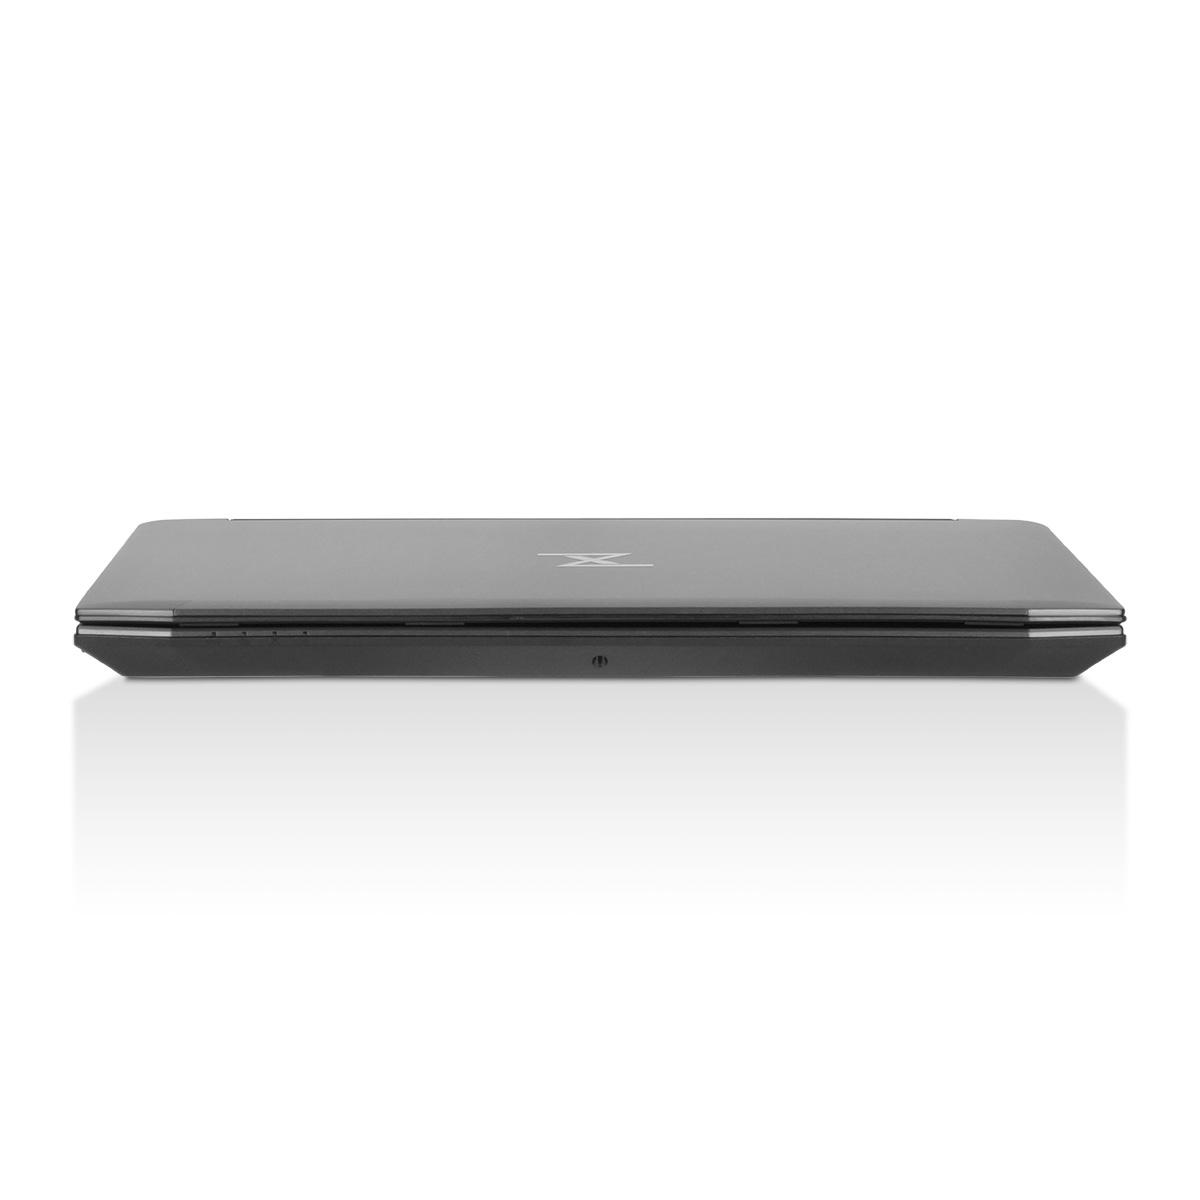 TUXEDO Book XC1407 v2 - 14 Zoll matt Full-HD IPS-Display + ...